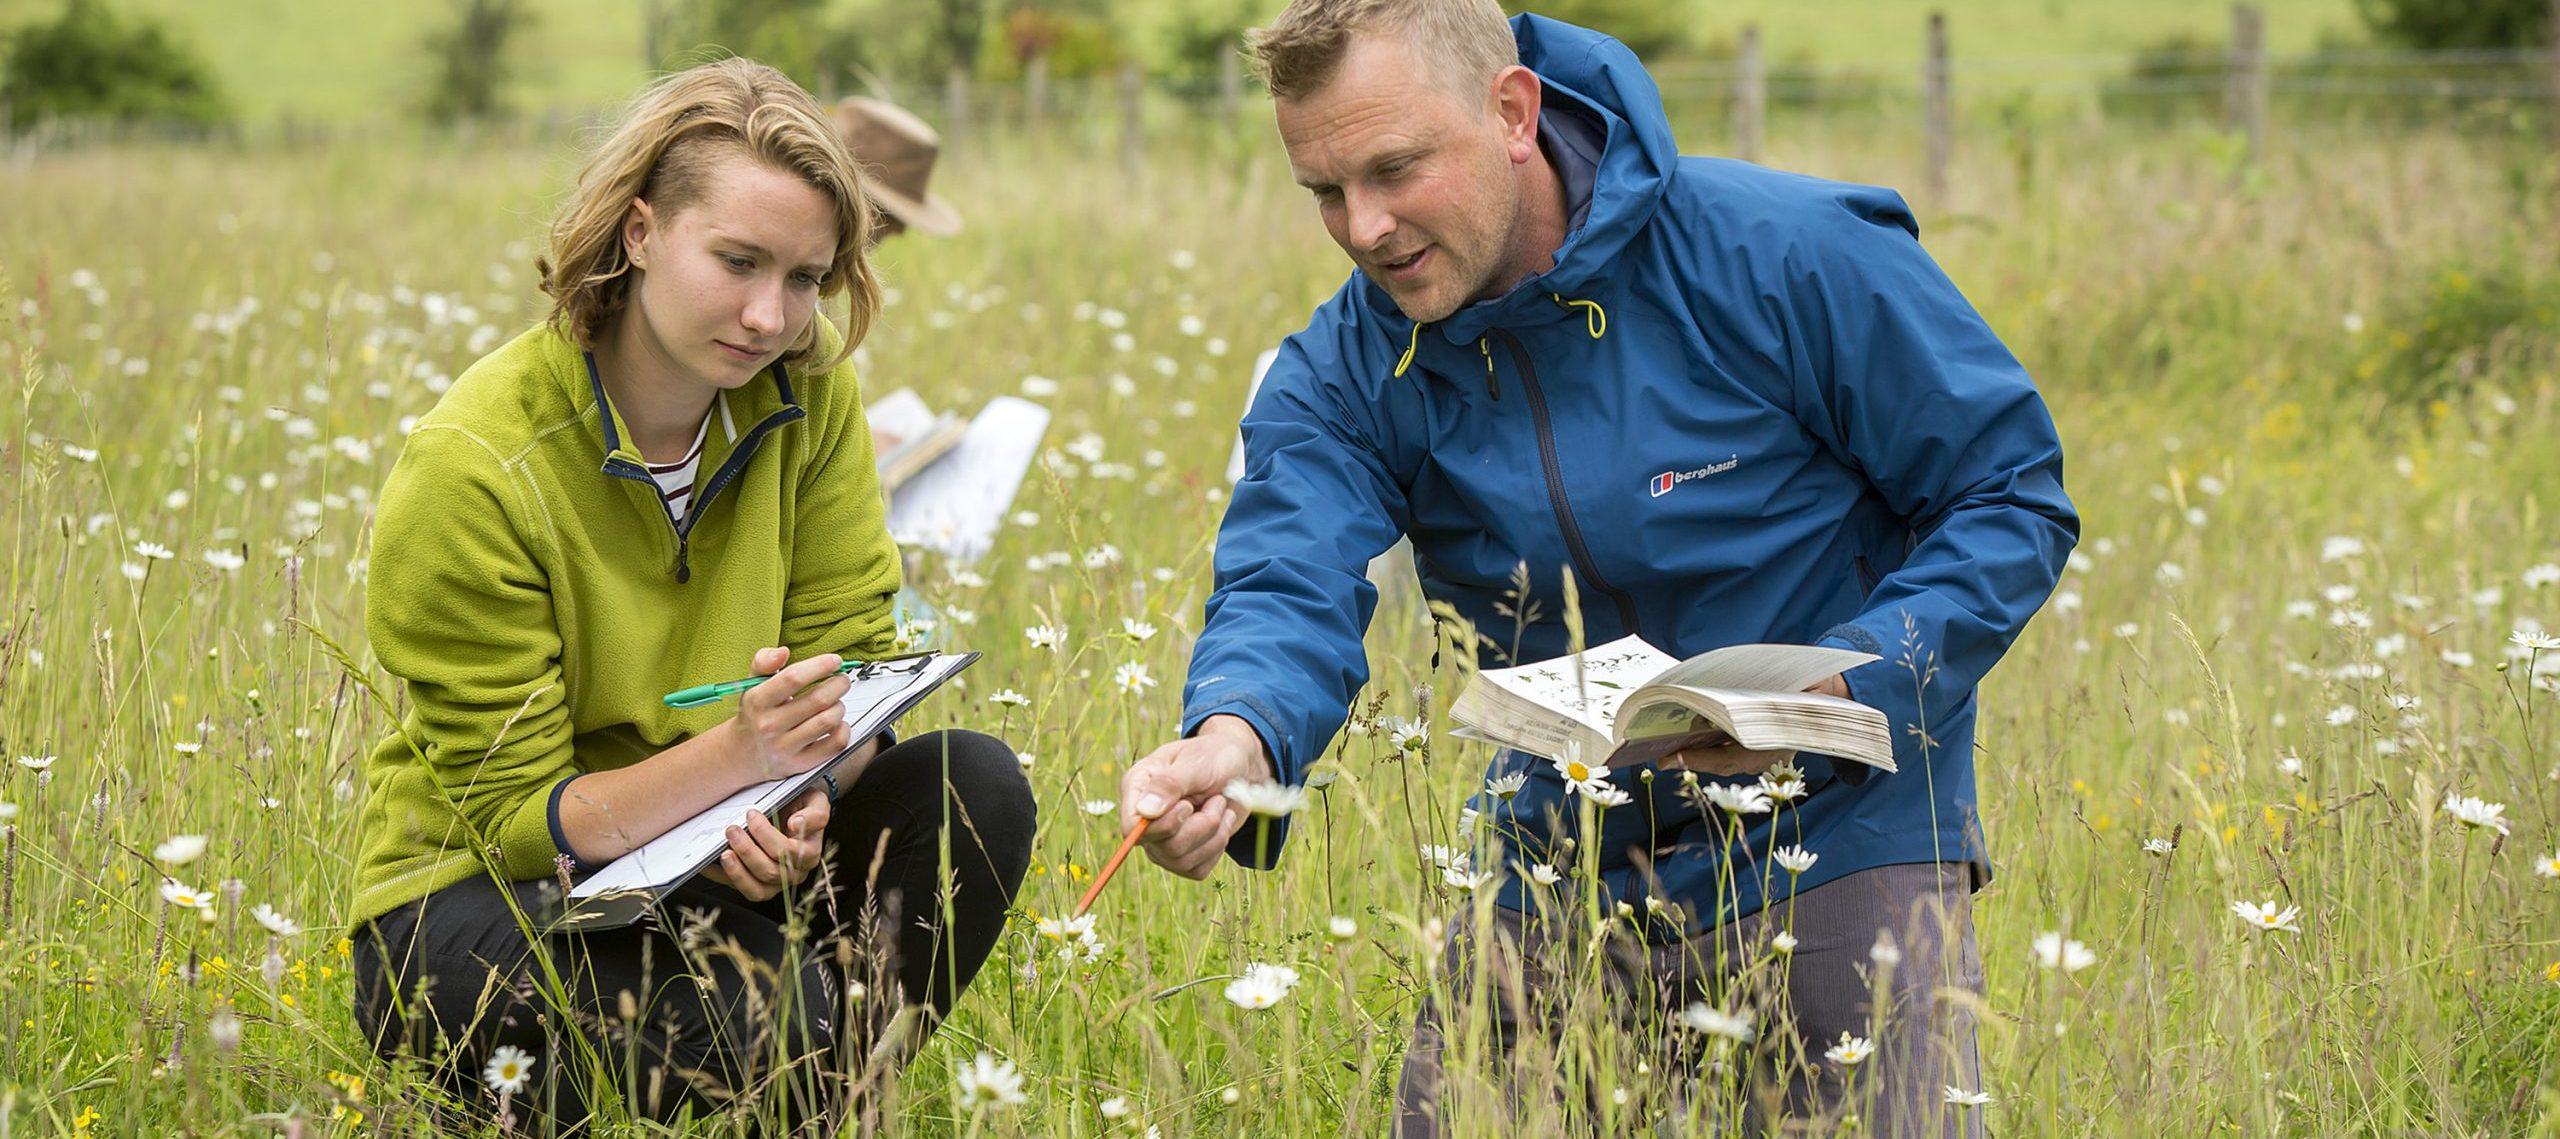 Conversation courses at Sparsholt College